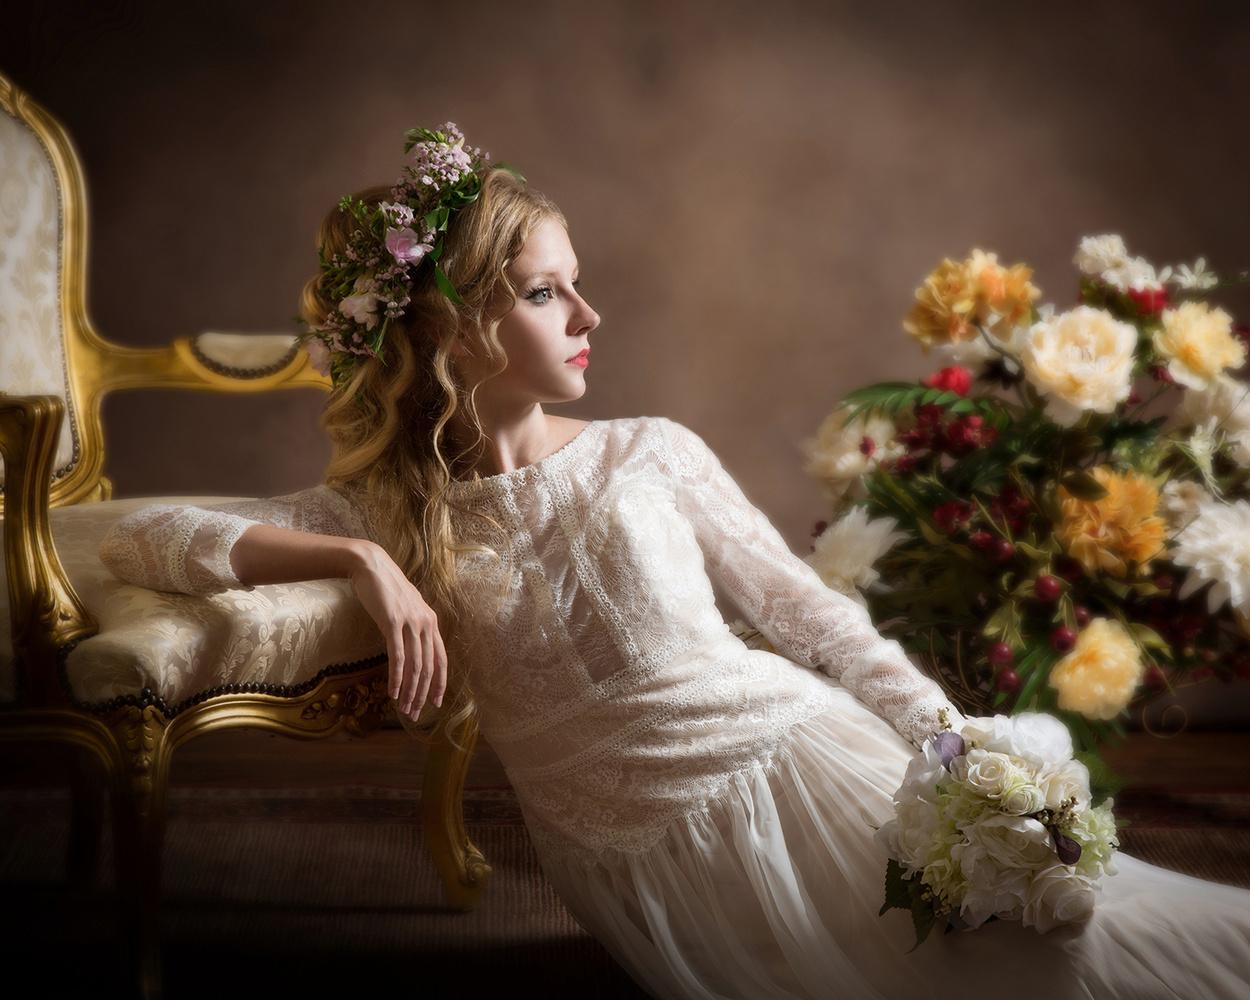 Bohemian Bride by Fran Willis